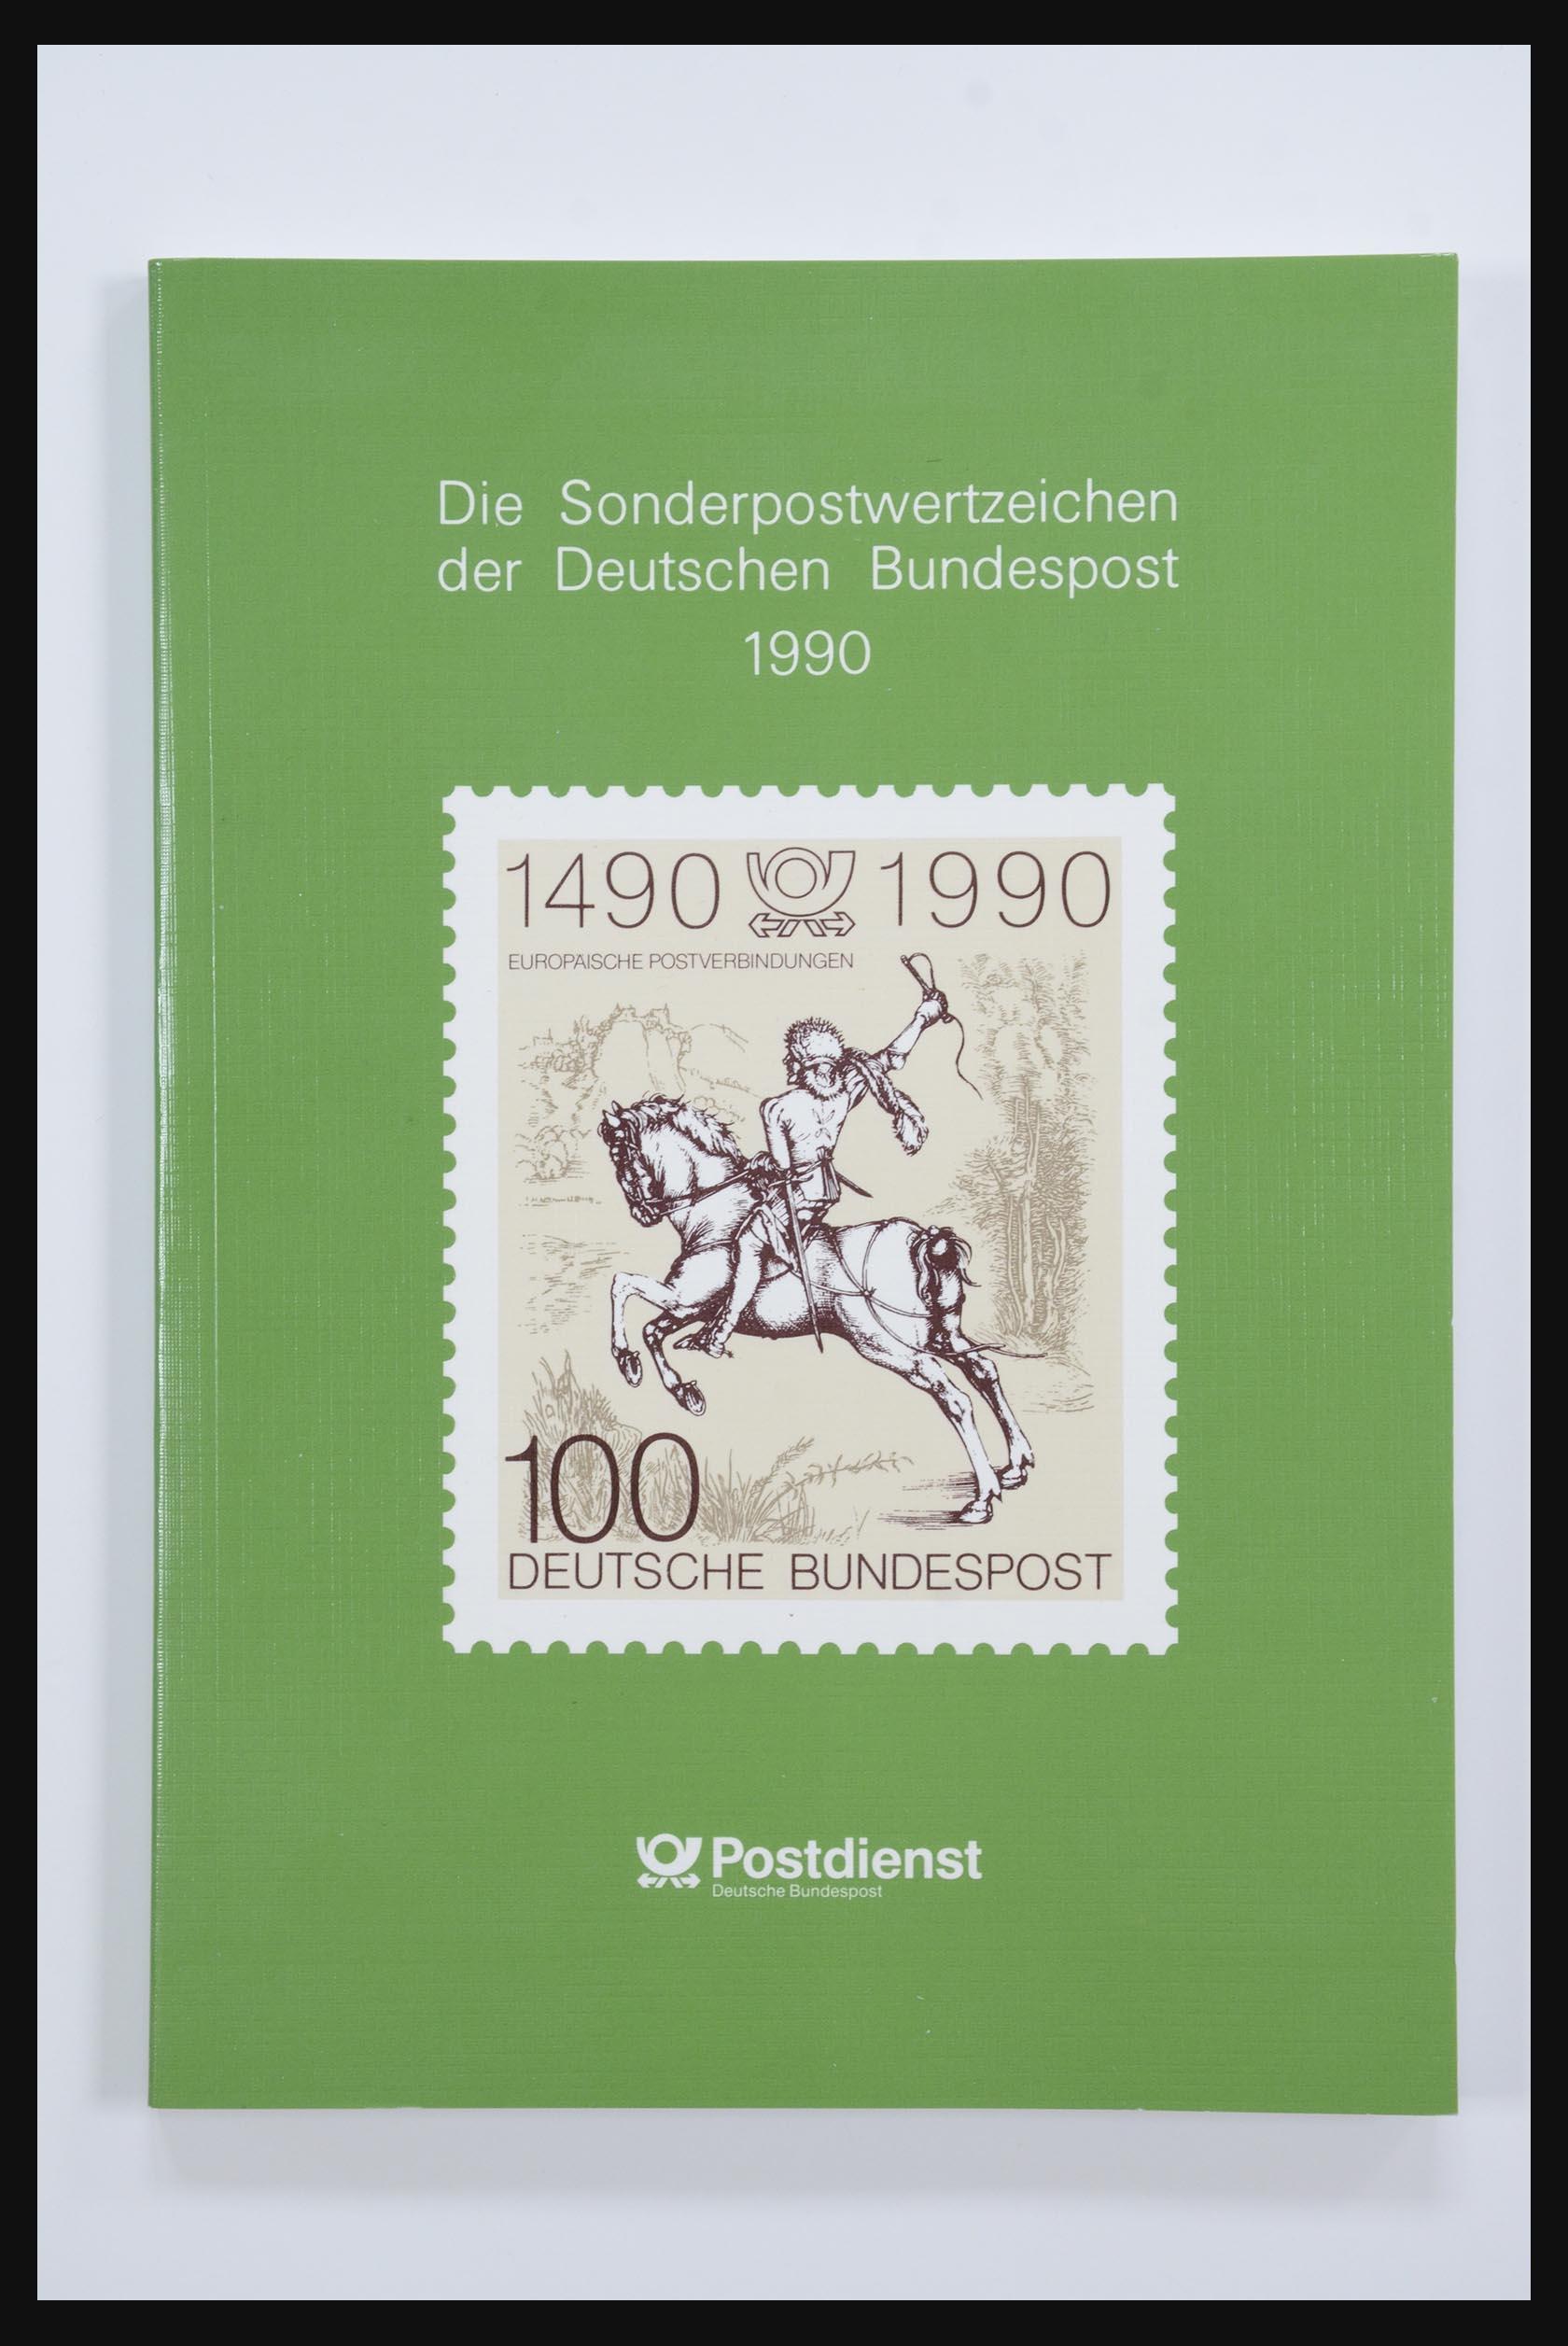 31834 018 - 31834 Bundespost yearbooks 1973(!)-1999.